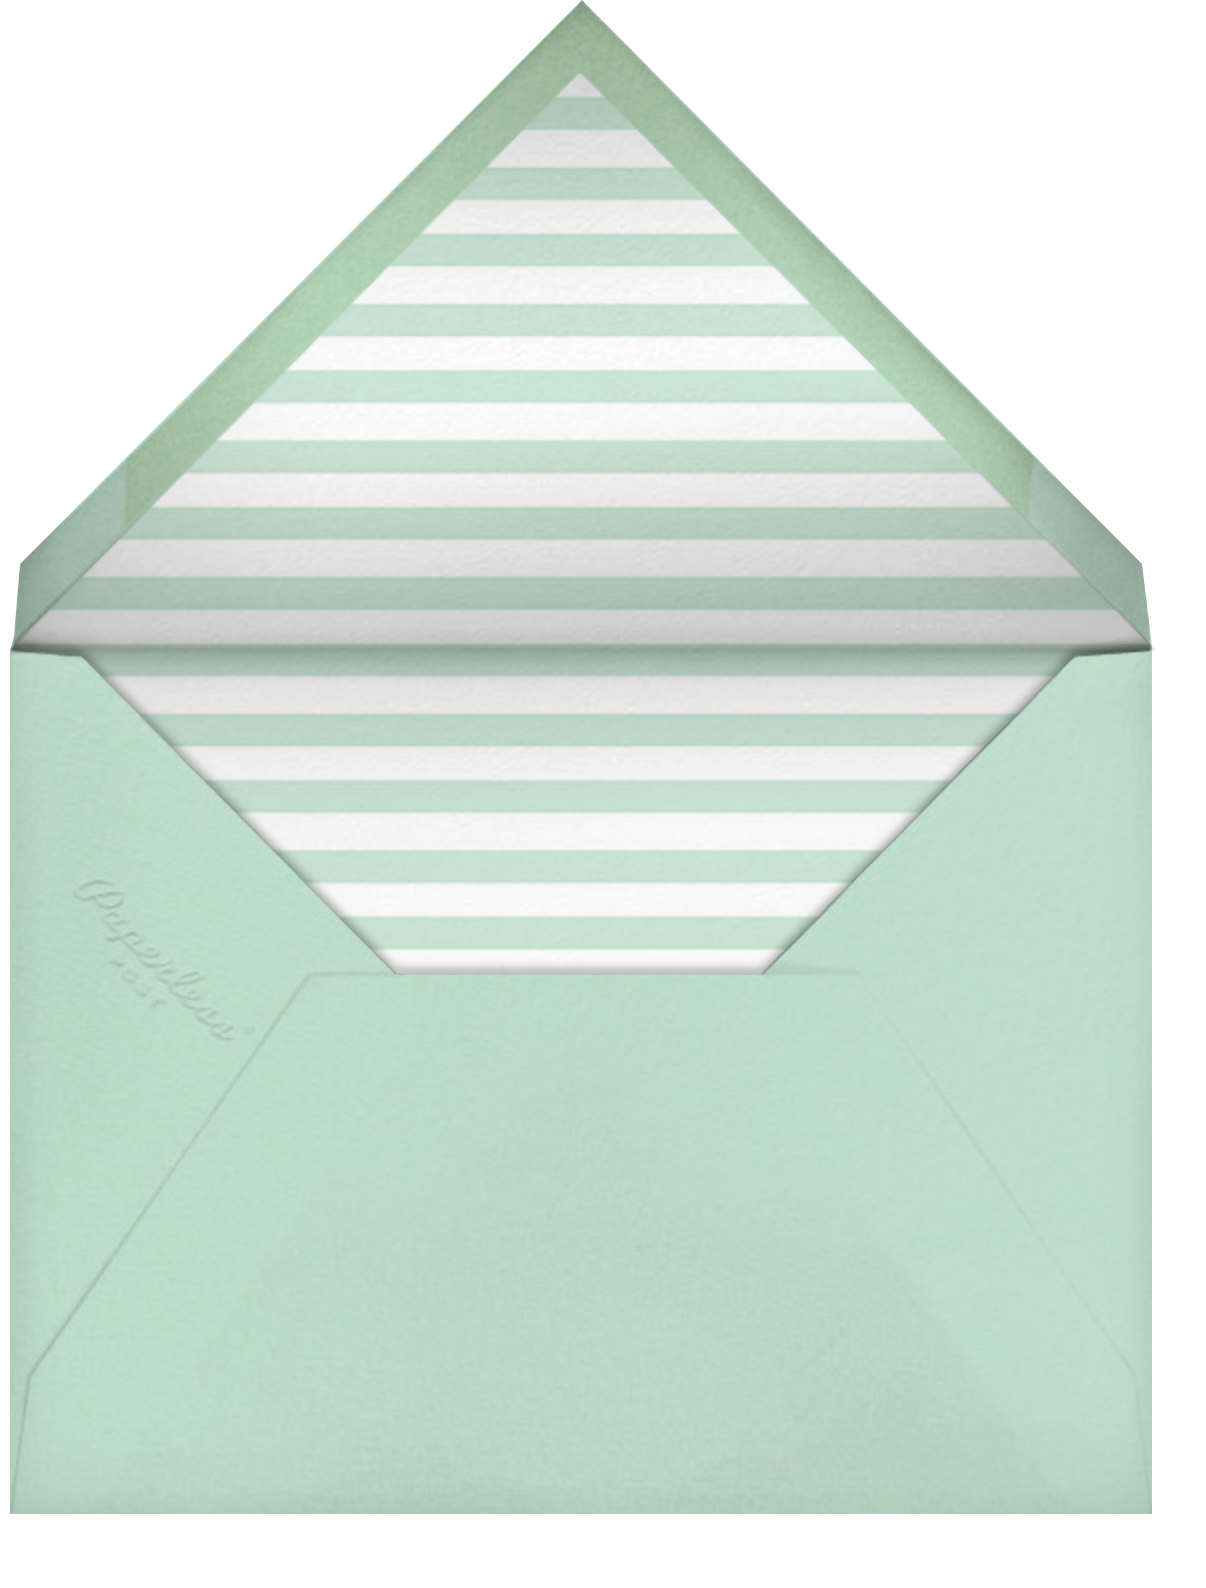 Simple Script (Invitation) - Mint - Paperless Post - All - envelope back